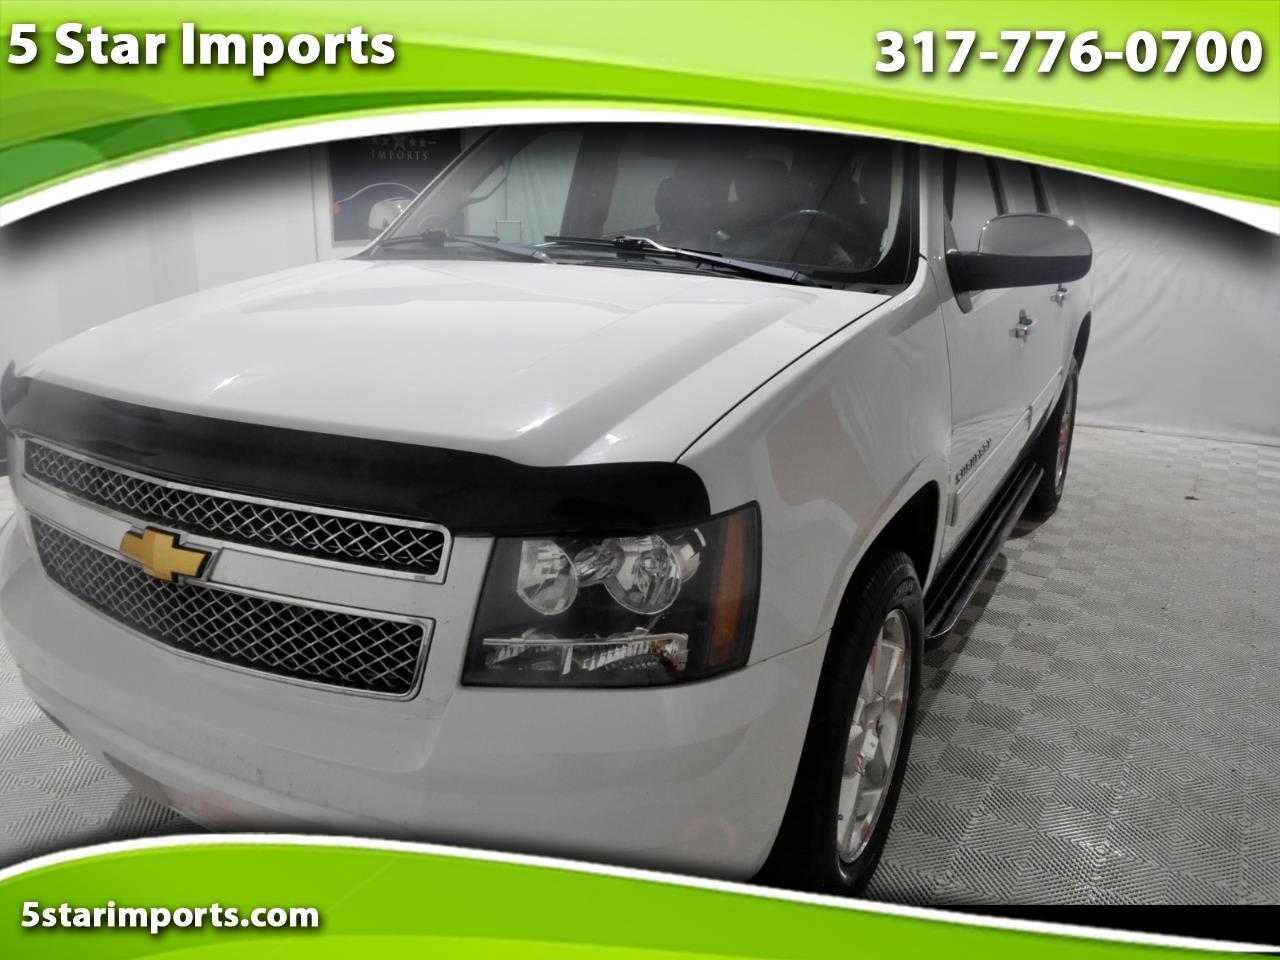 Chevrolet Suburban LT 1500 4WD 2012